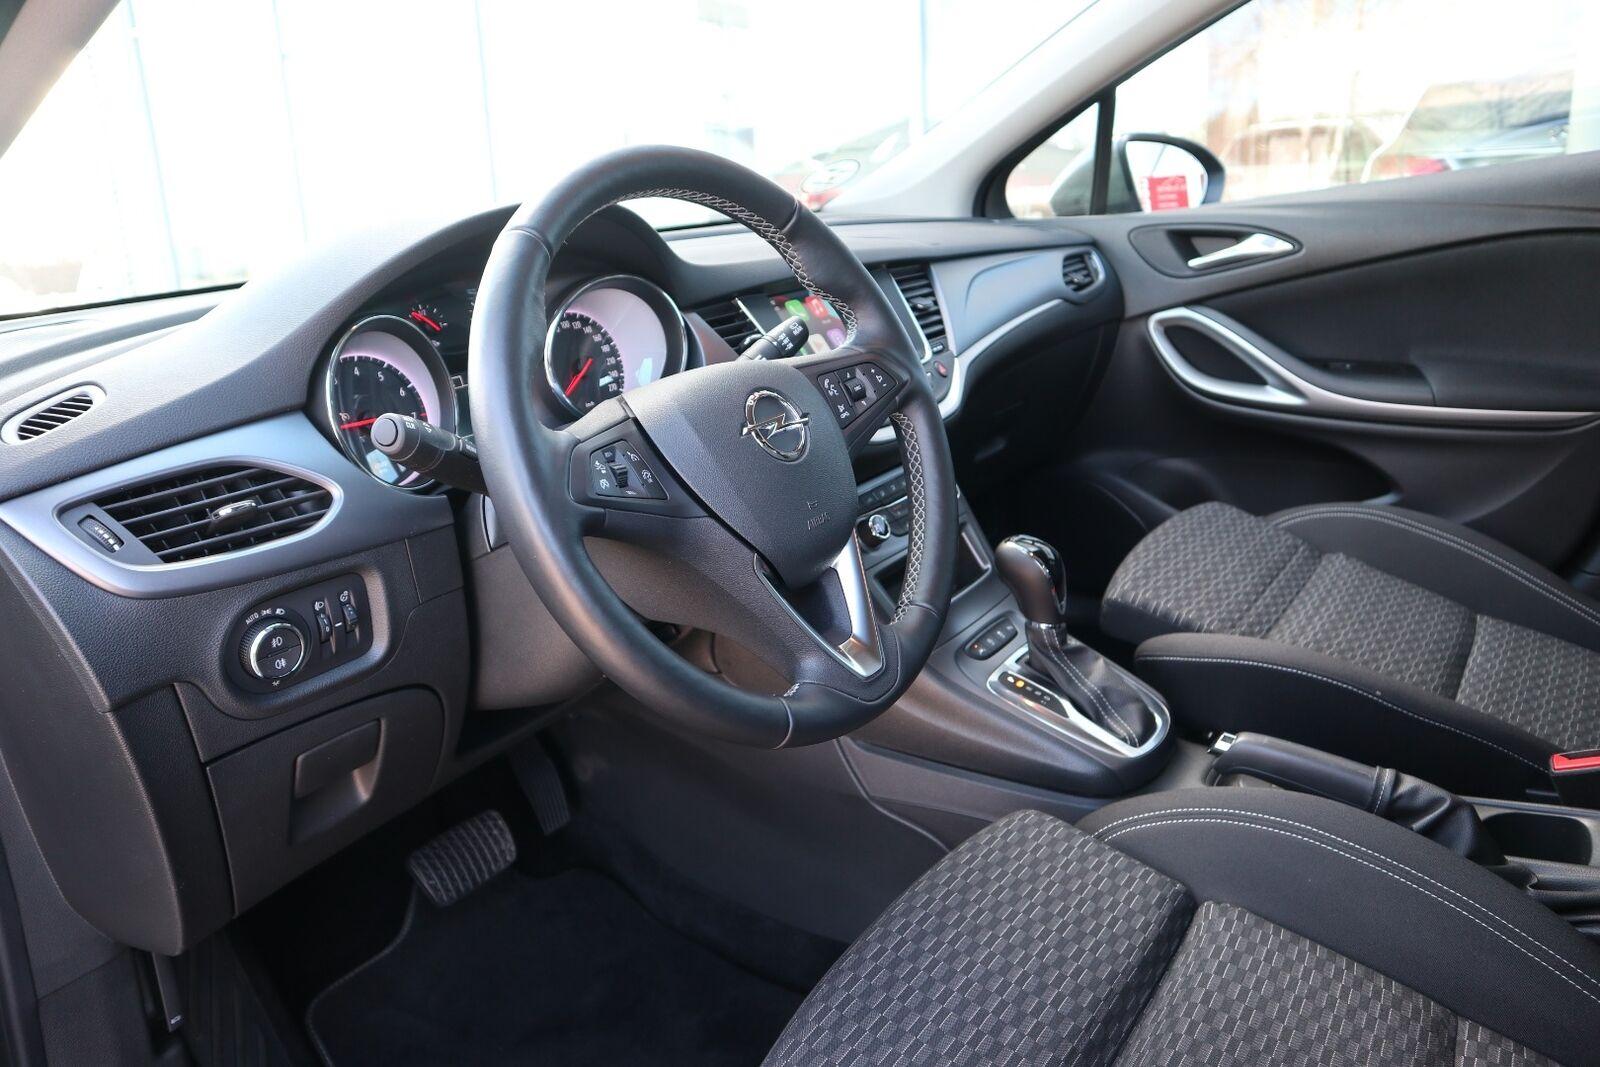 Opel Astra 1,4 T 150 Impress aut.